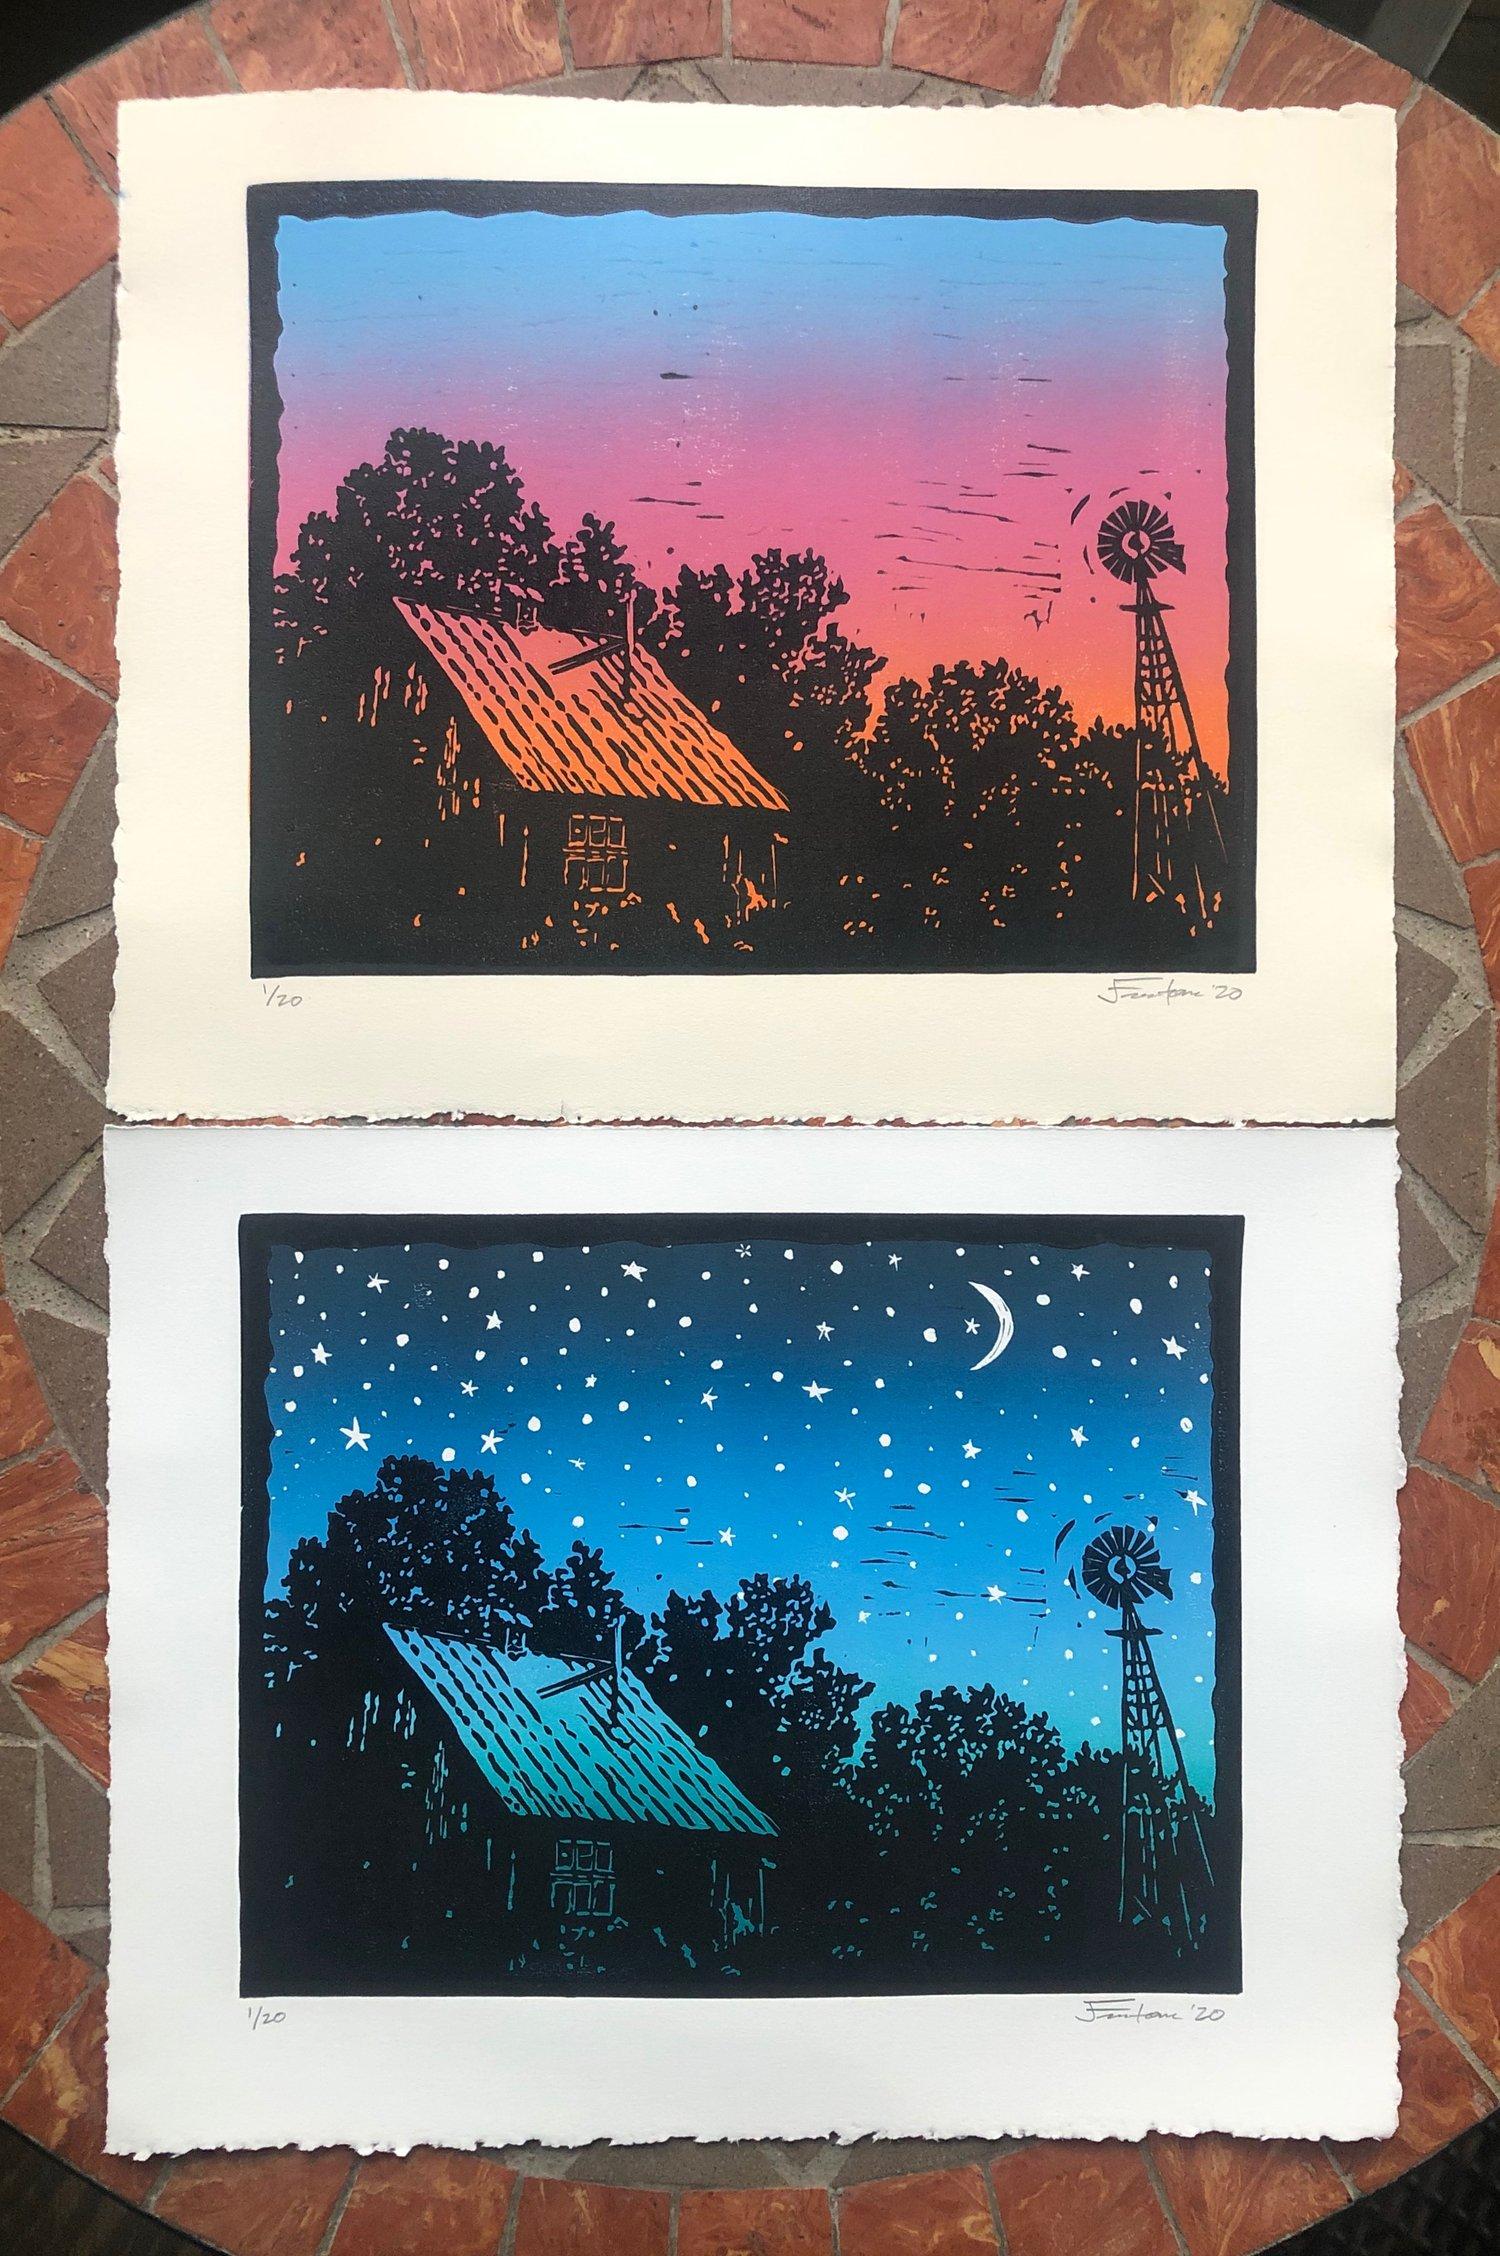 Image of Old Barns prints